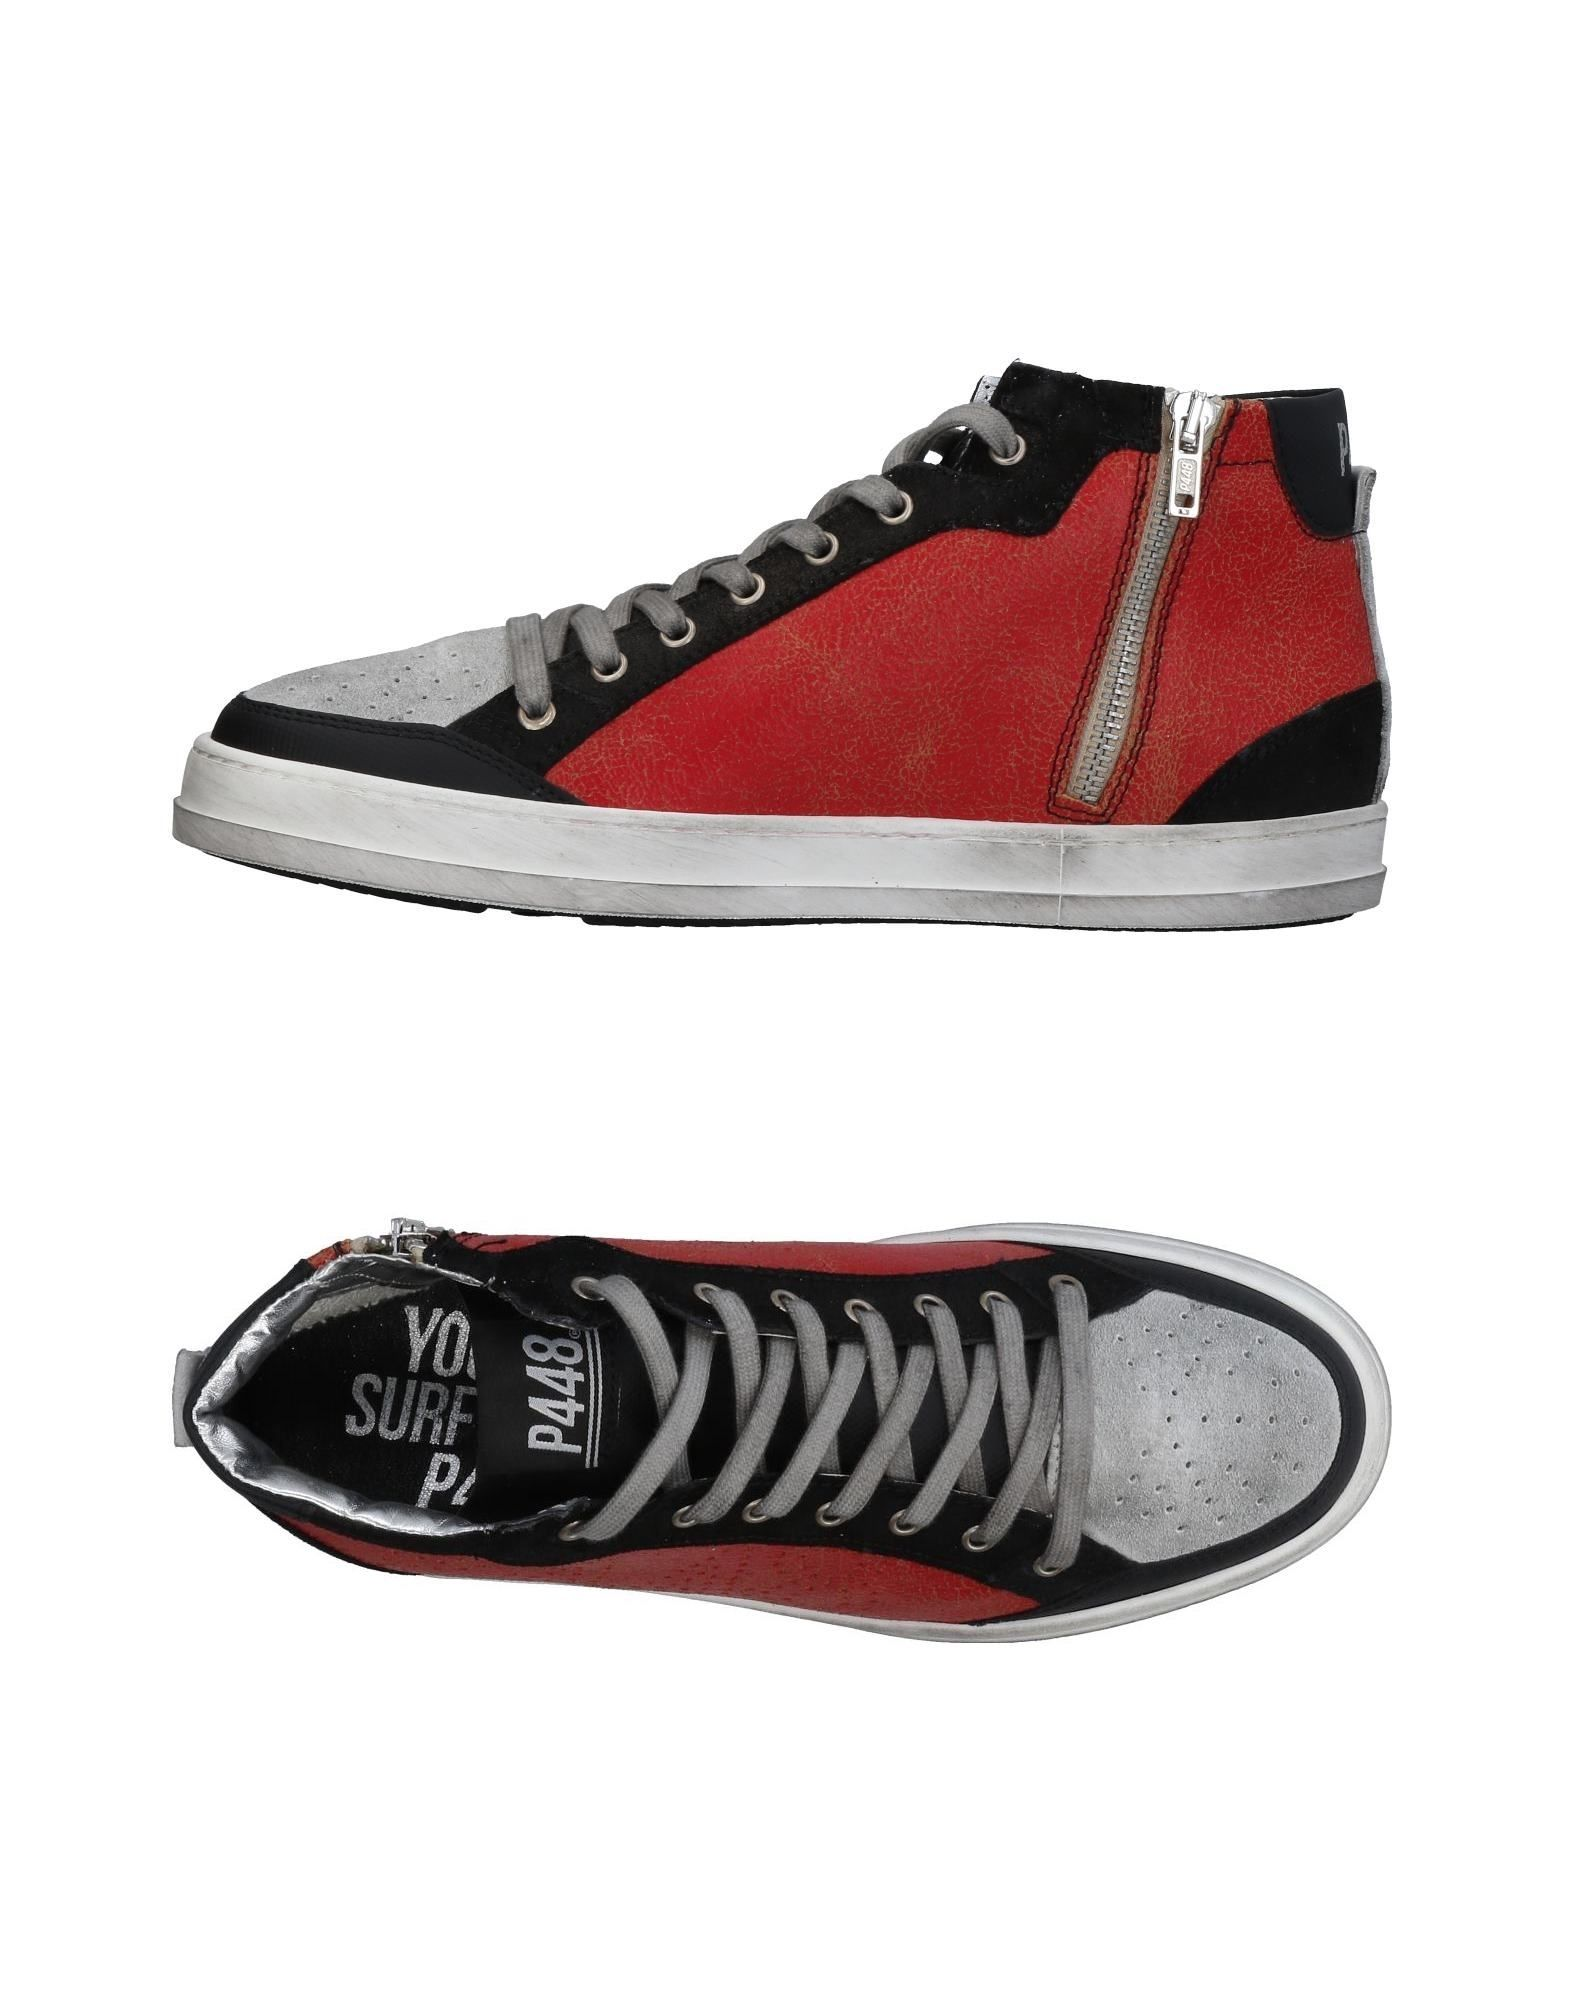 Moda Sneakers P448 Uomo - 11457220WG